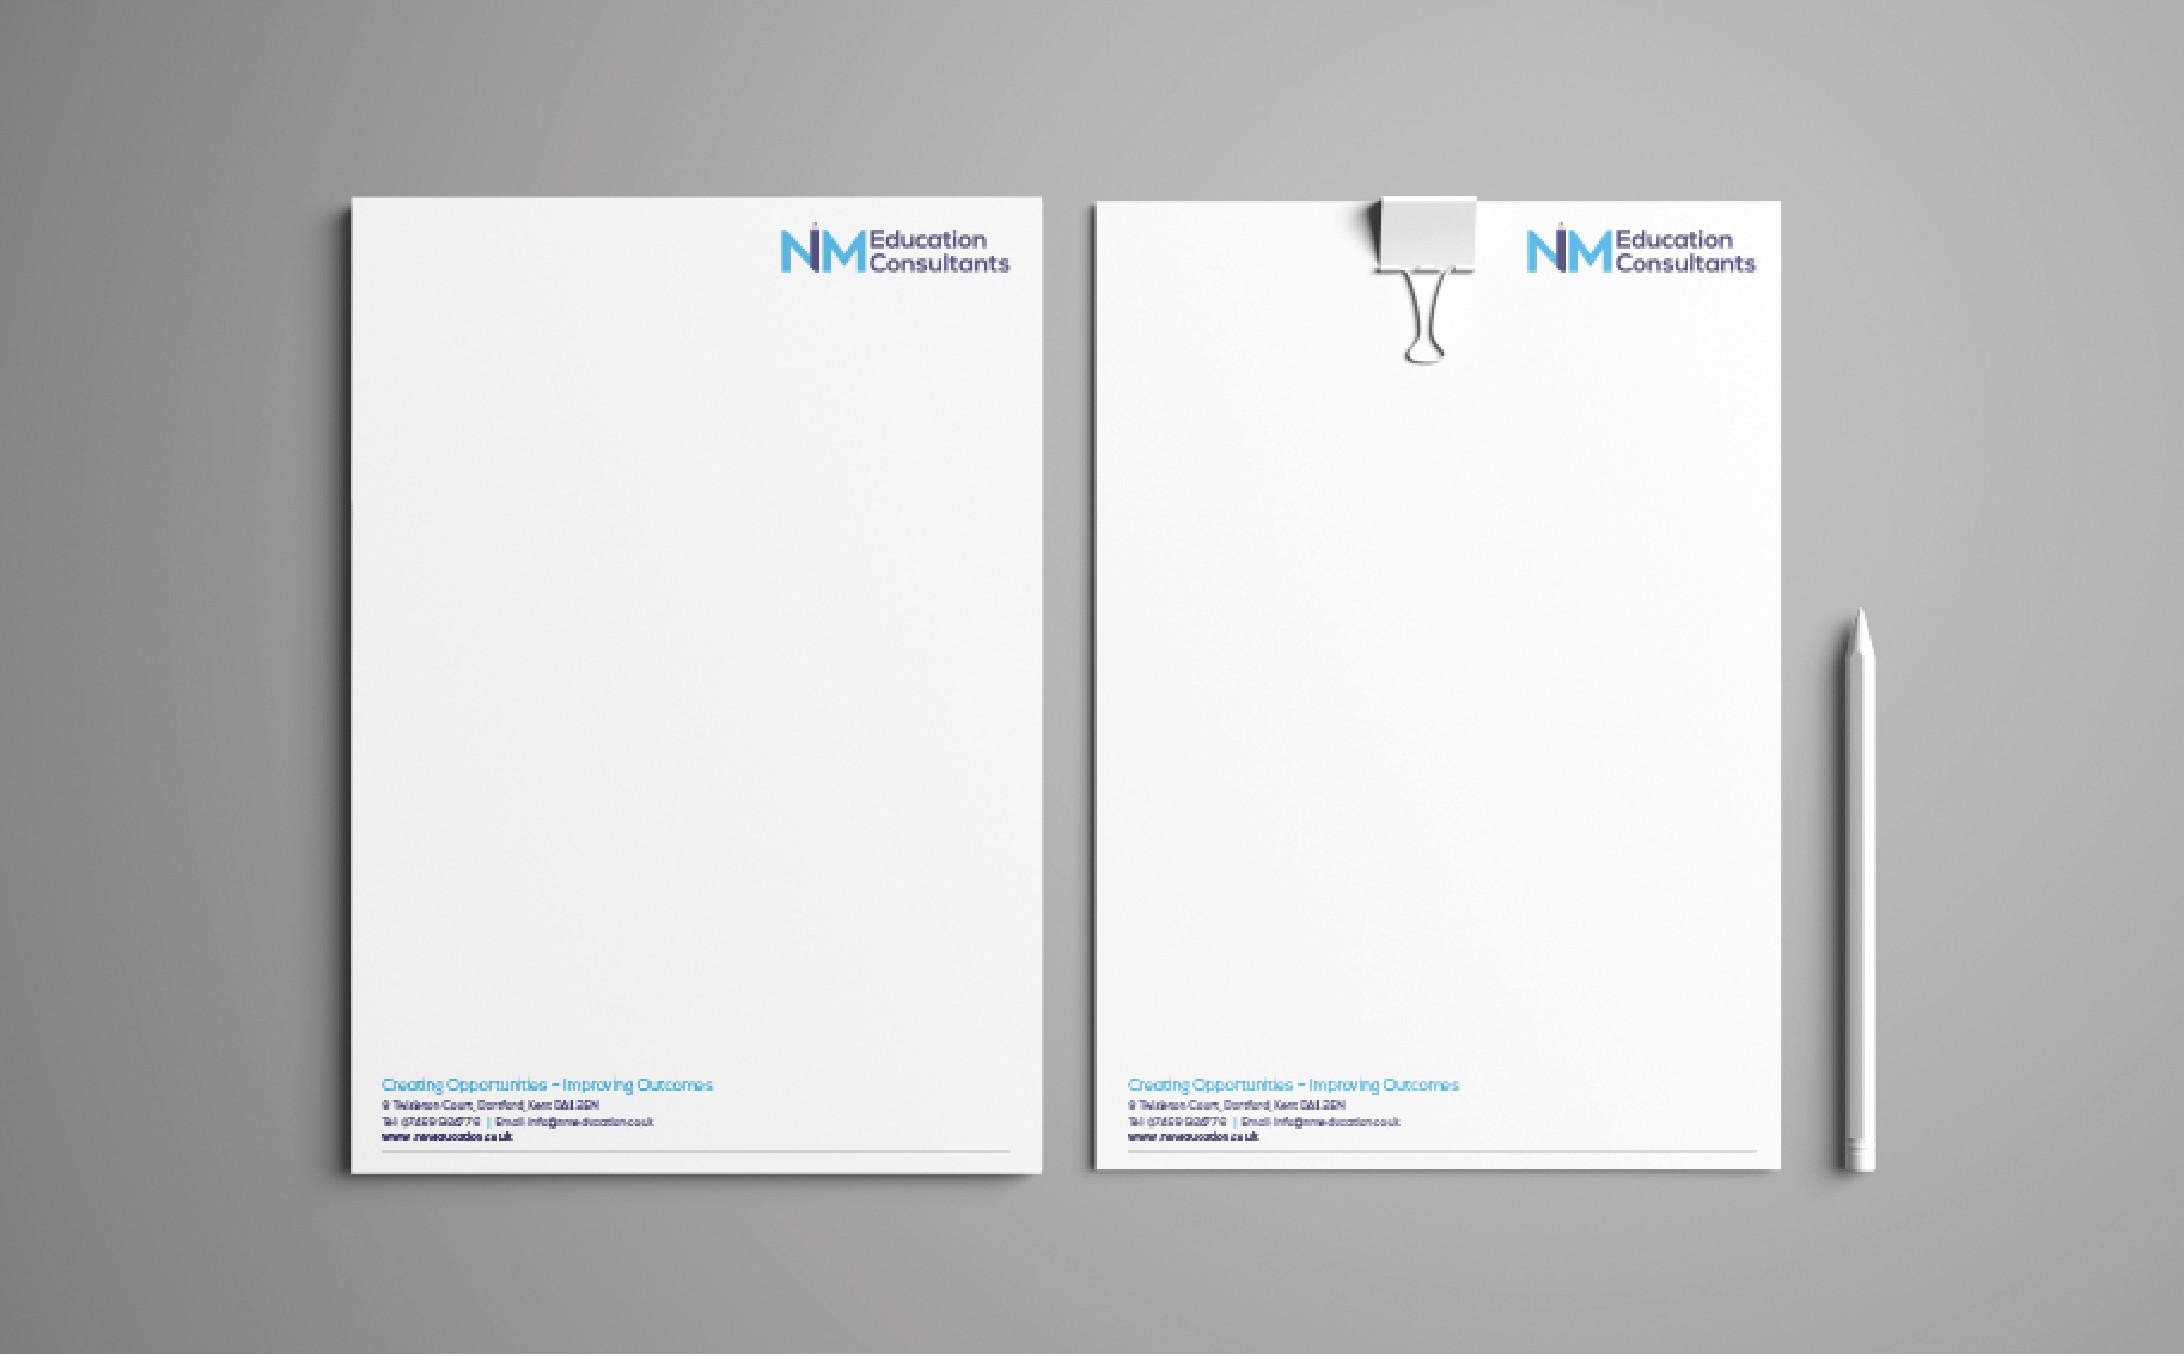 NM Education Consultants letterheads